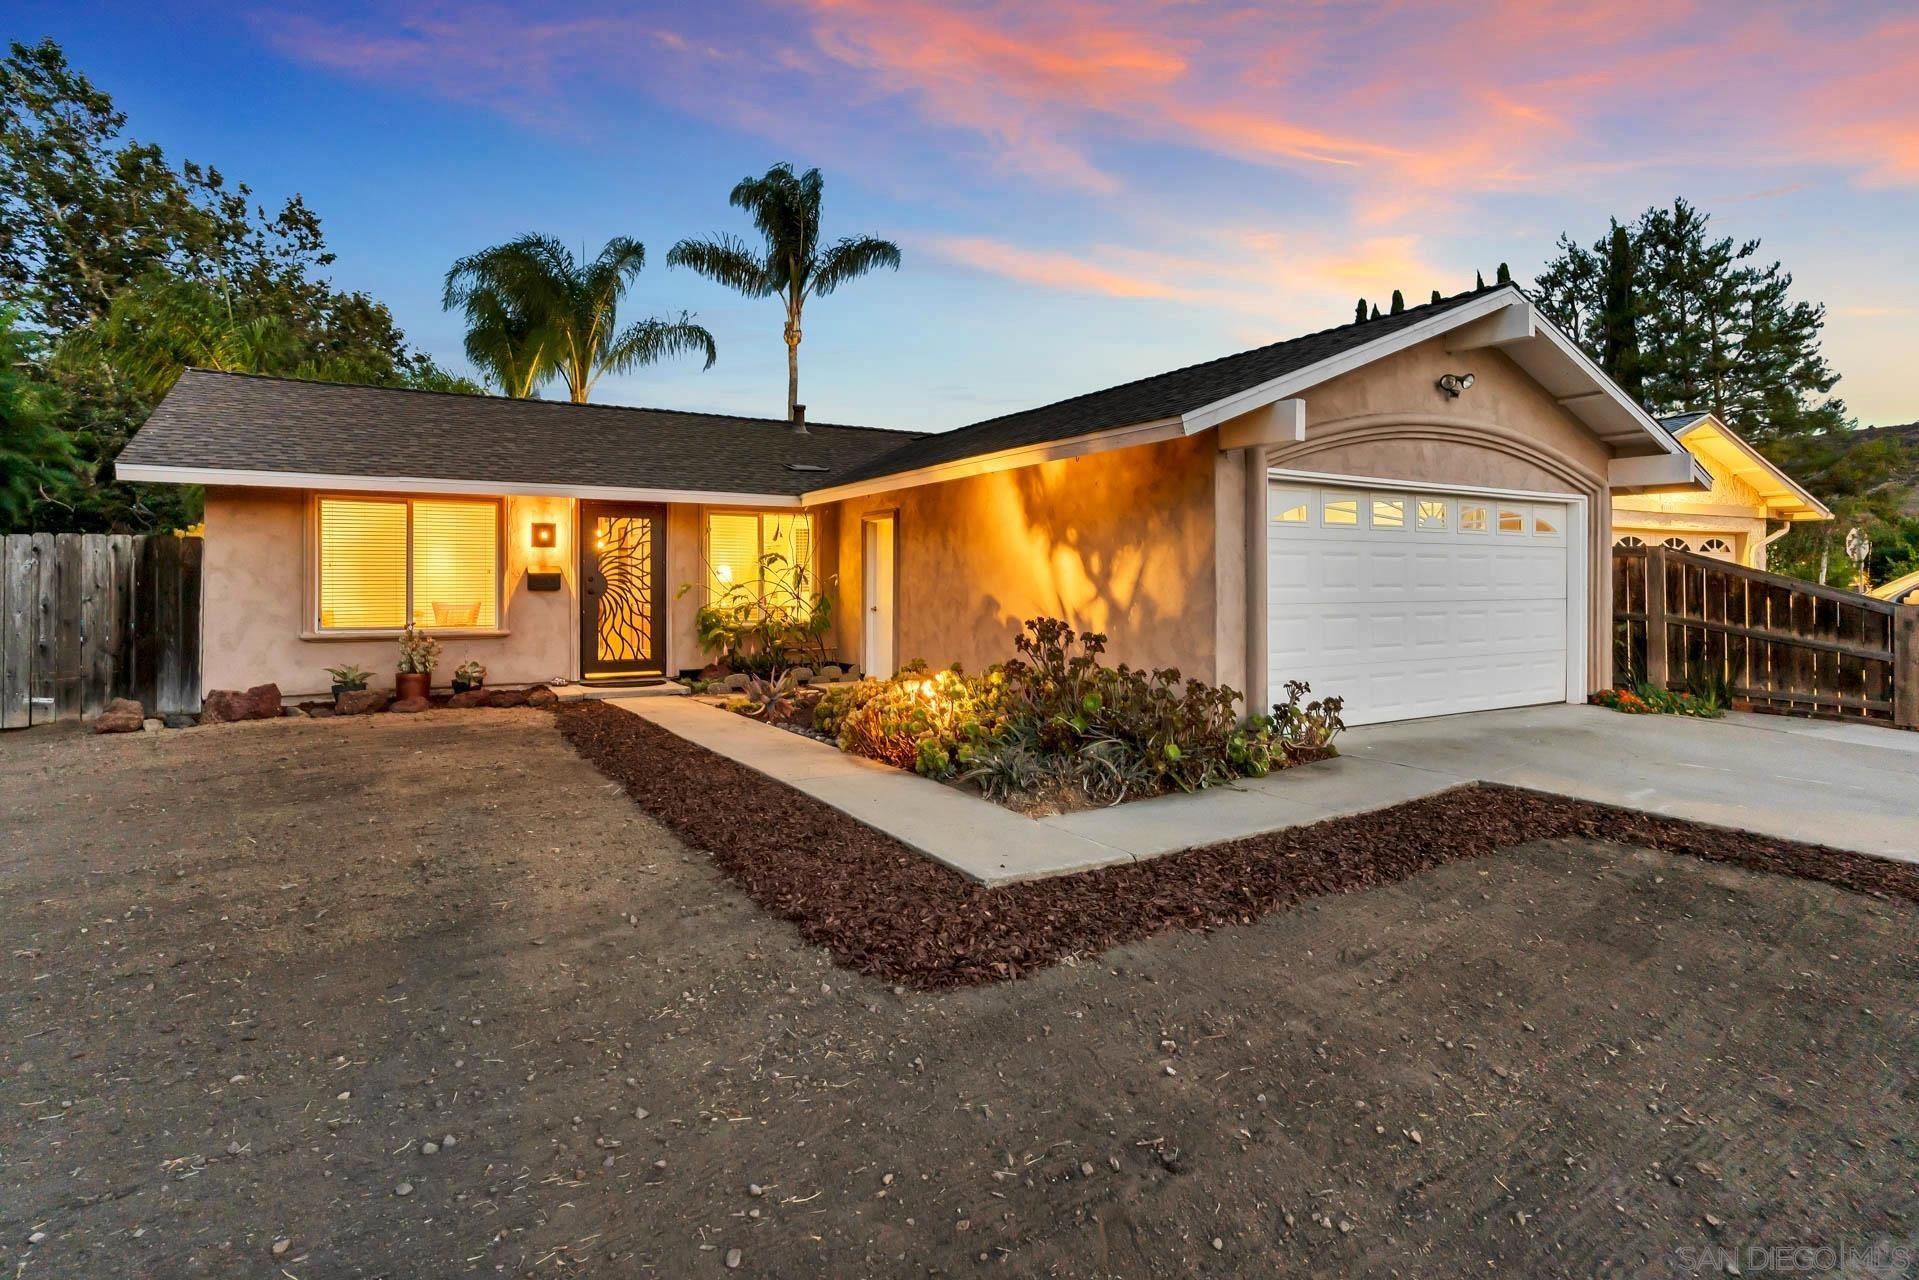 Photo of 13103 Gate Dr., Poway, CA 92064 (MLS # 210020015)